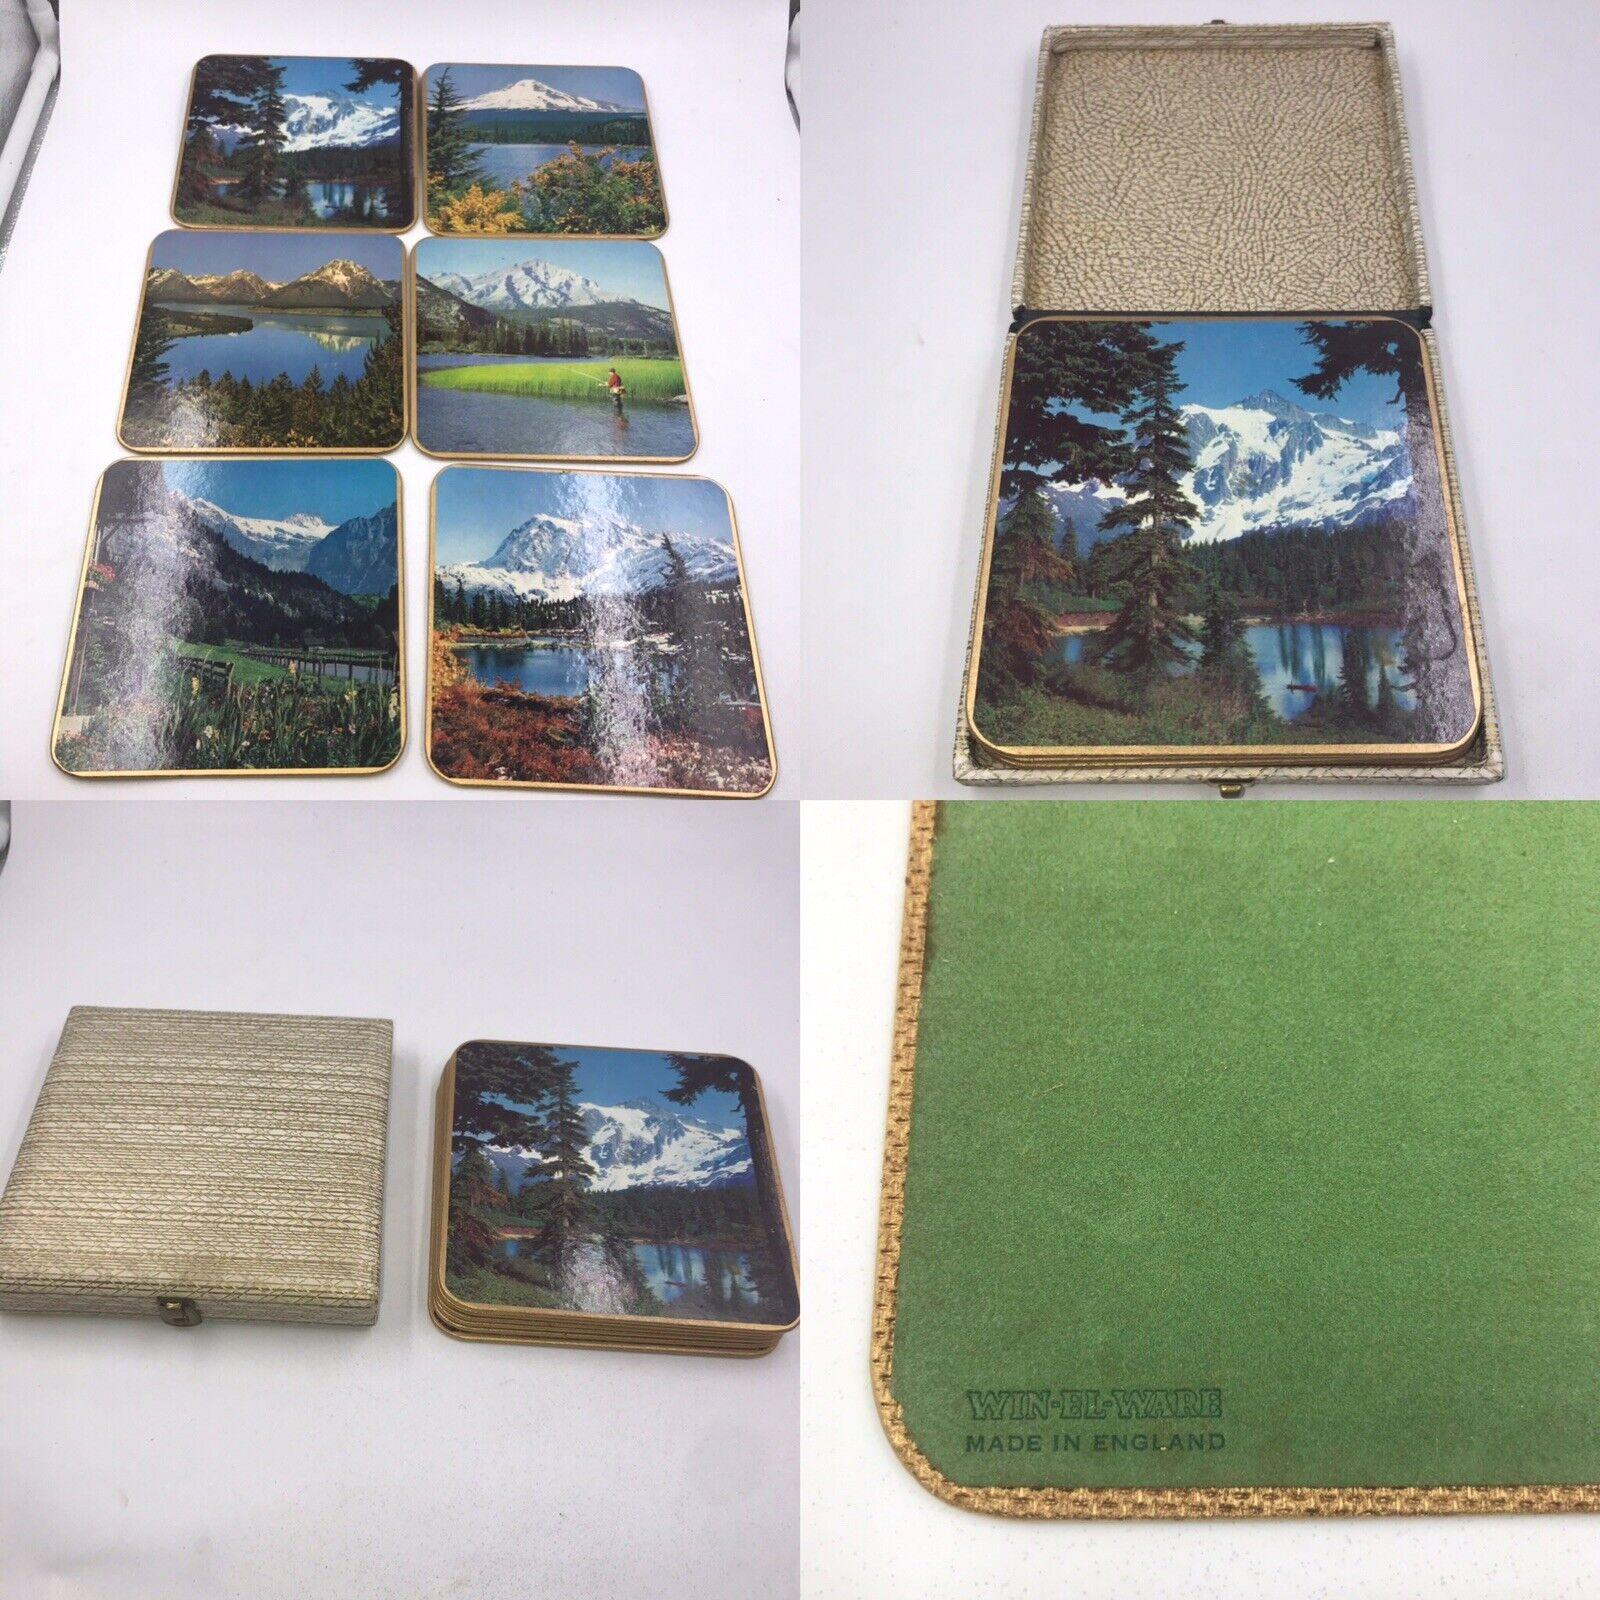 Vintage Win El Ware Kitsch 70's Swiss Alpine Scenes Square Placemats Boxed Rare